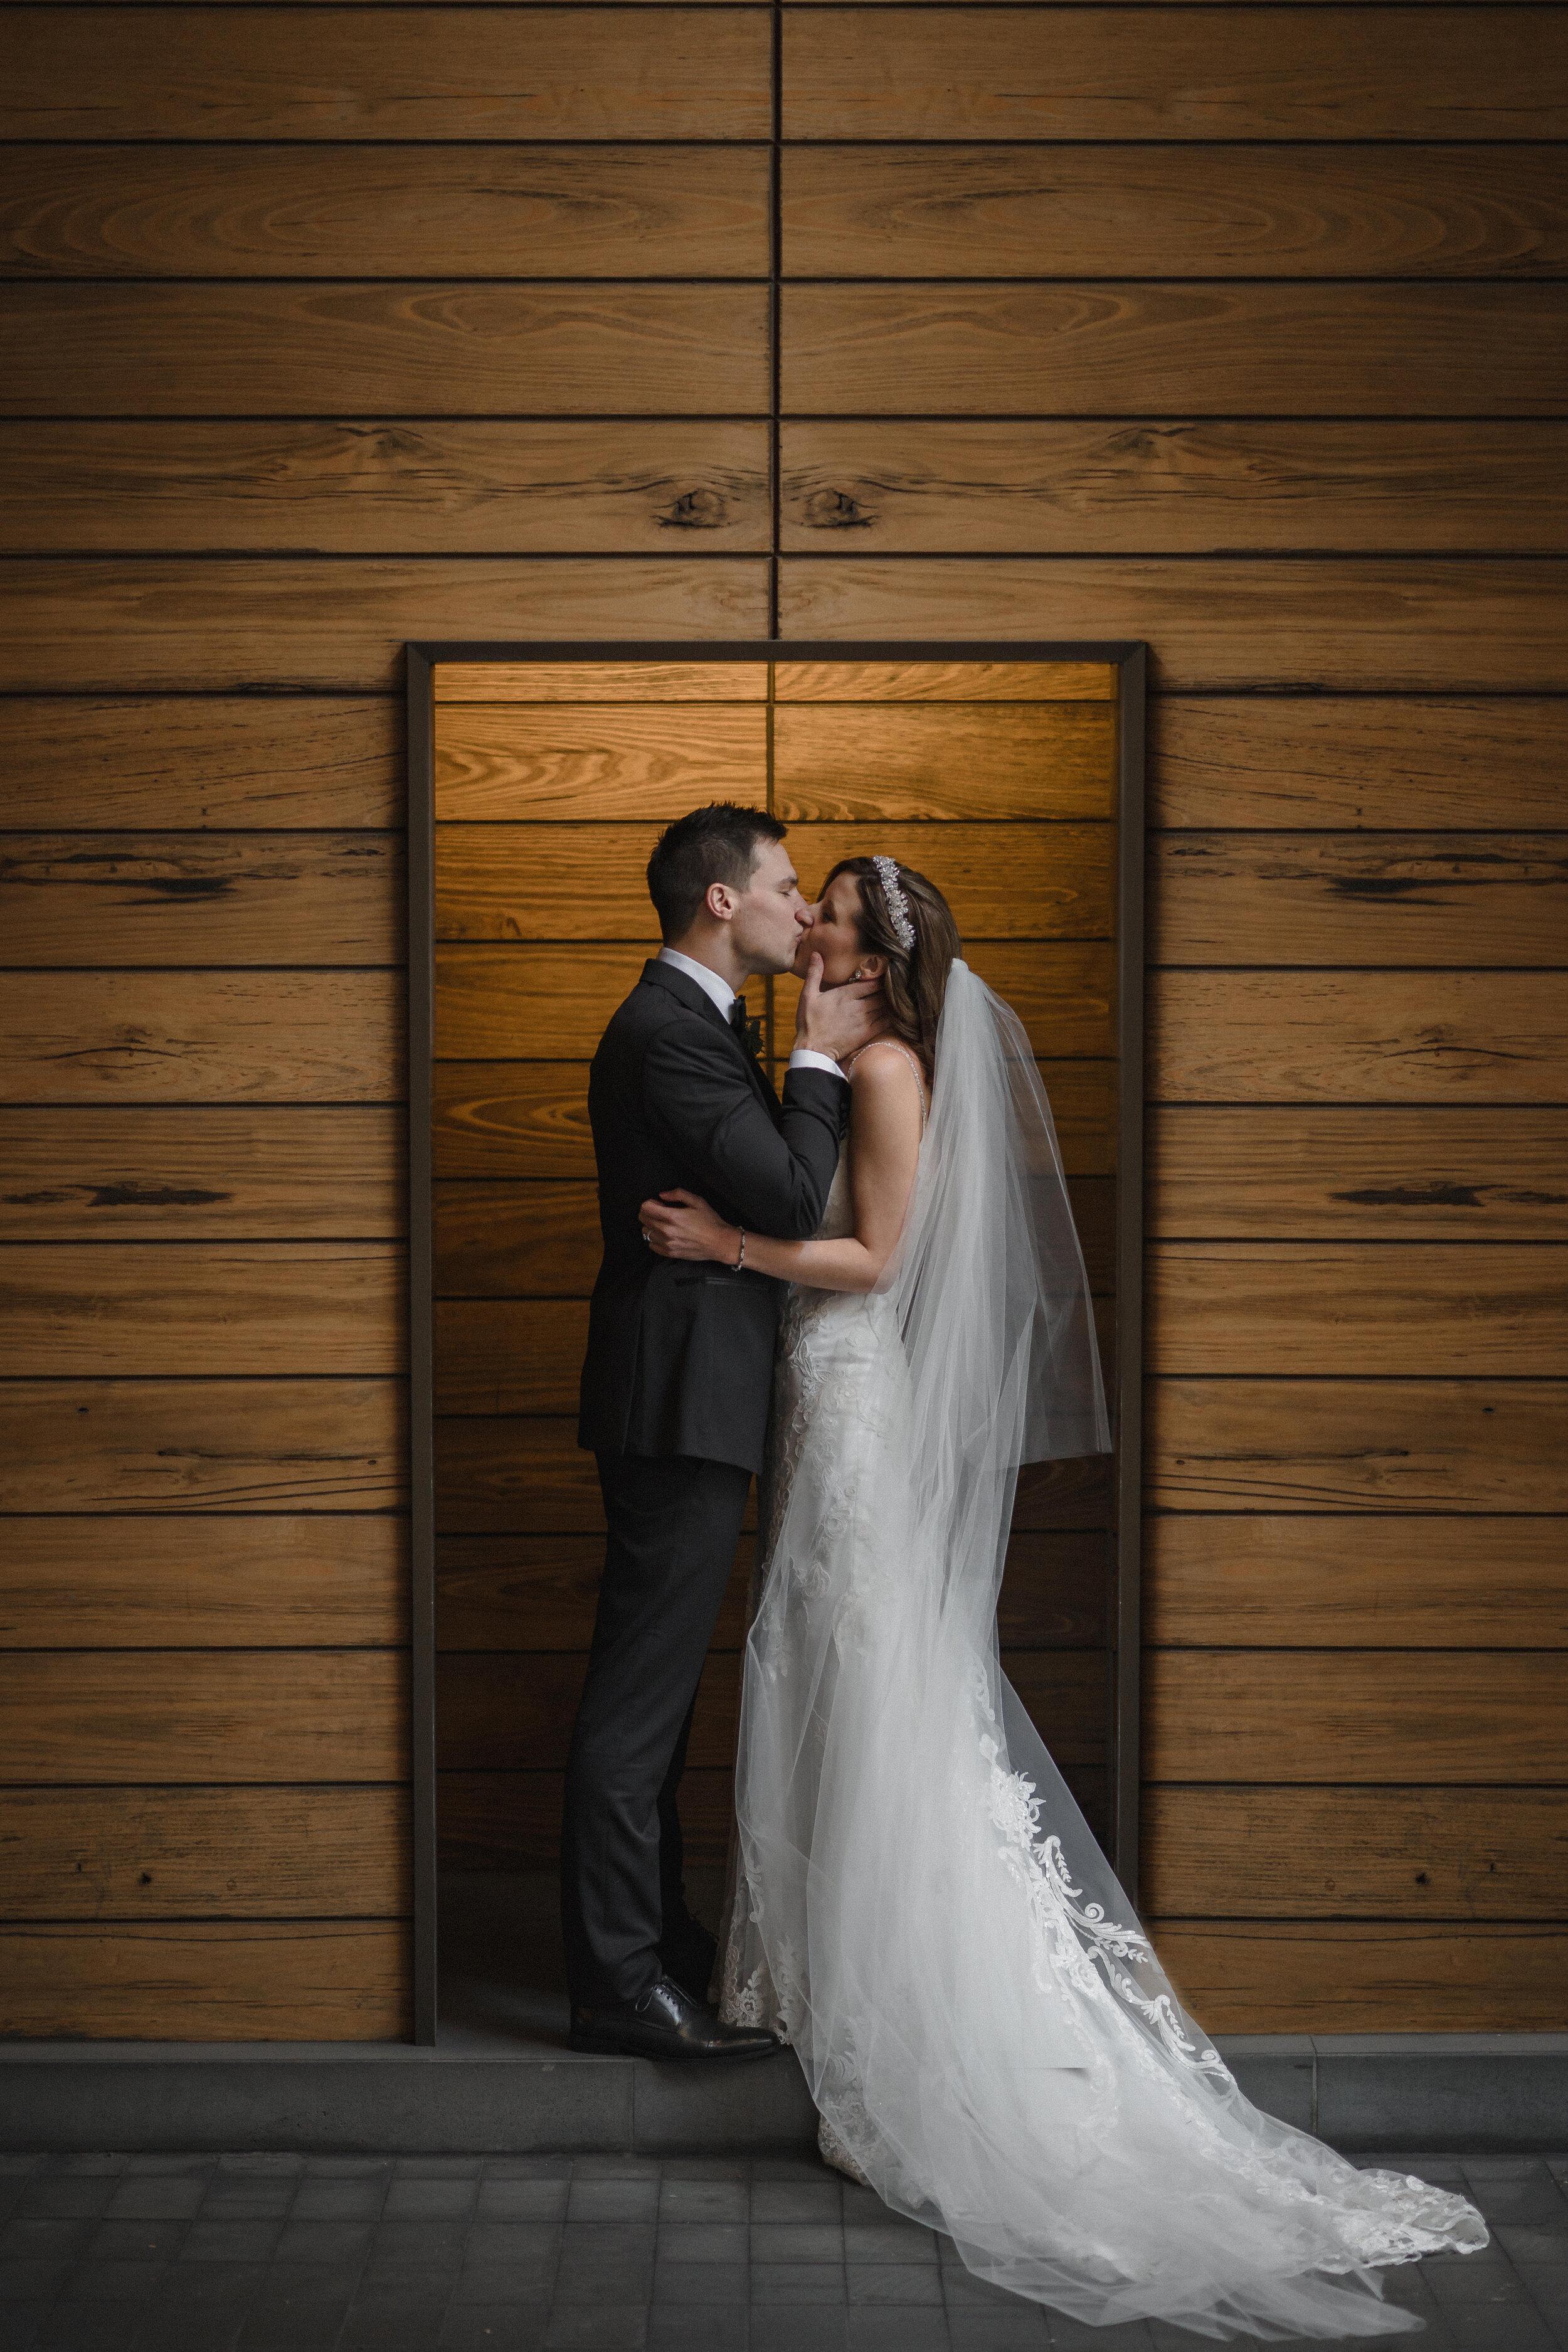 Corey Wright Melbourne Wedding Photgraphy_021.jpg